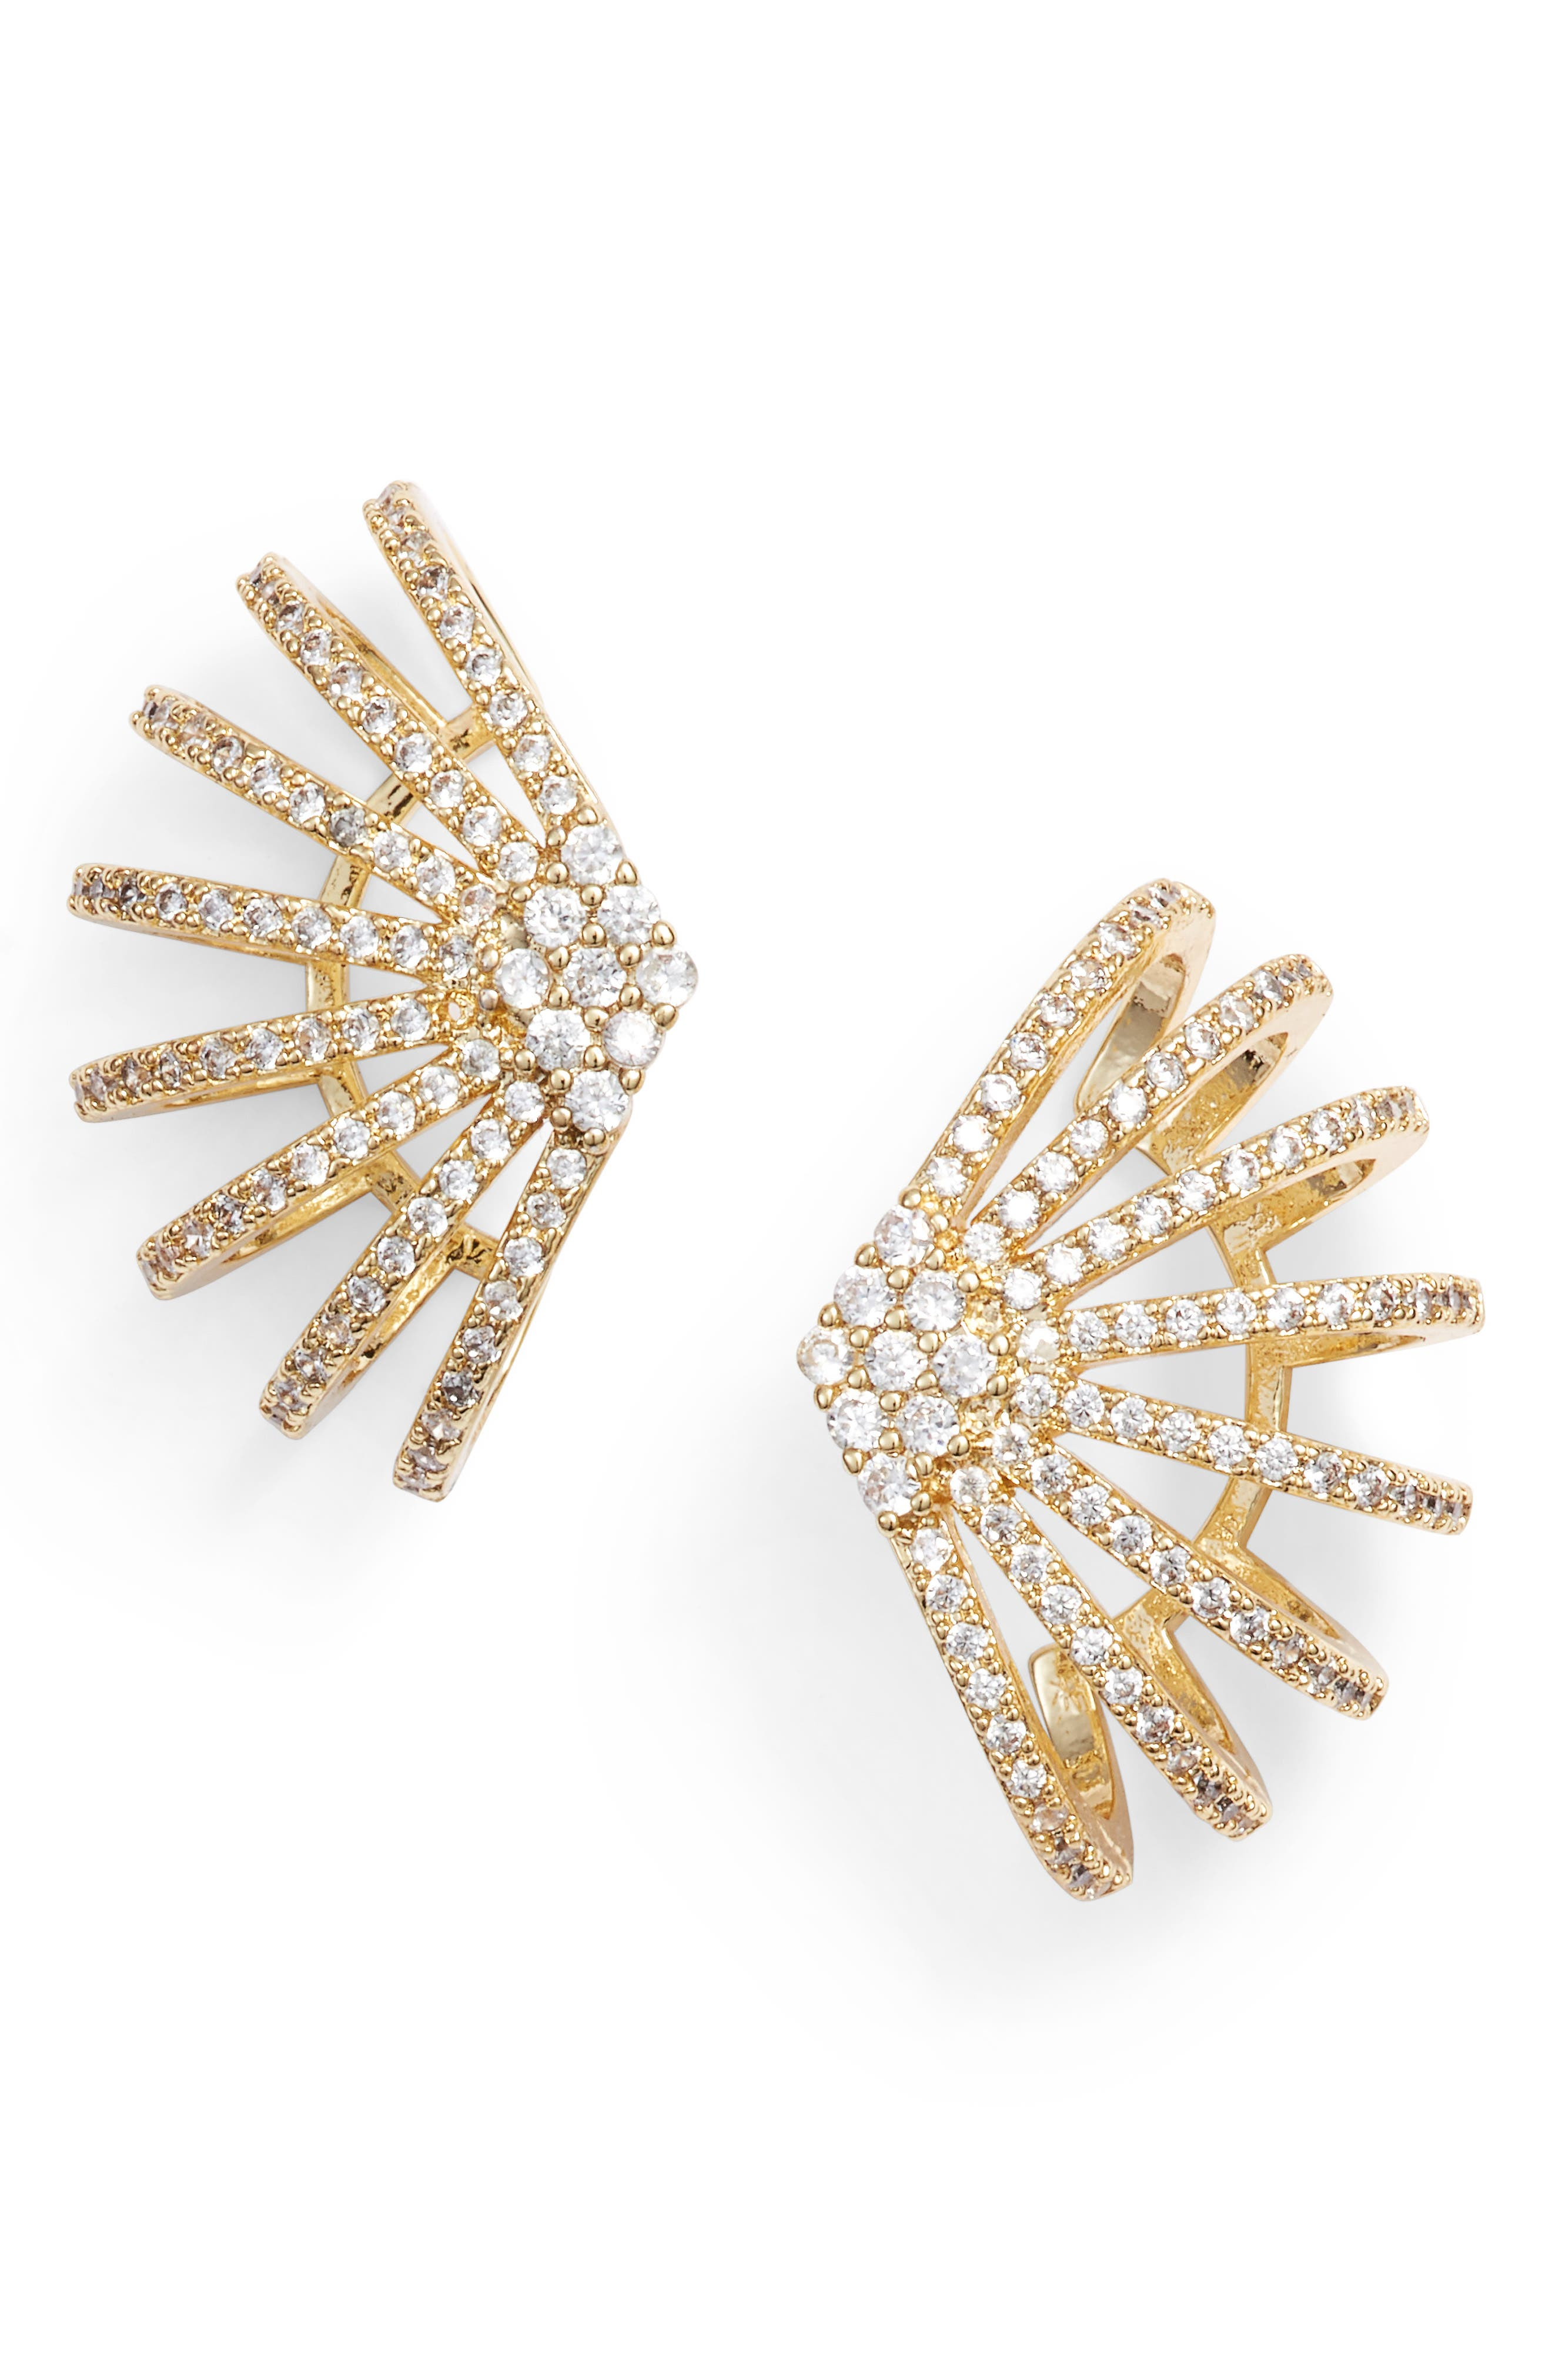 MELINDA MARIA Cubic Zirconia Earrings in Clear/ Gold